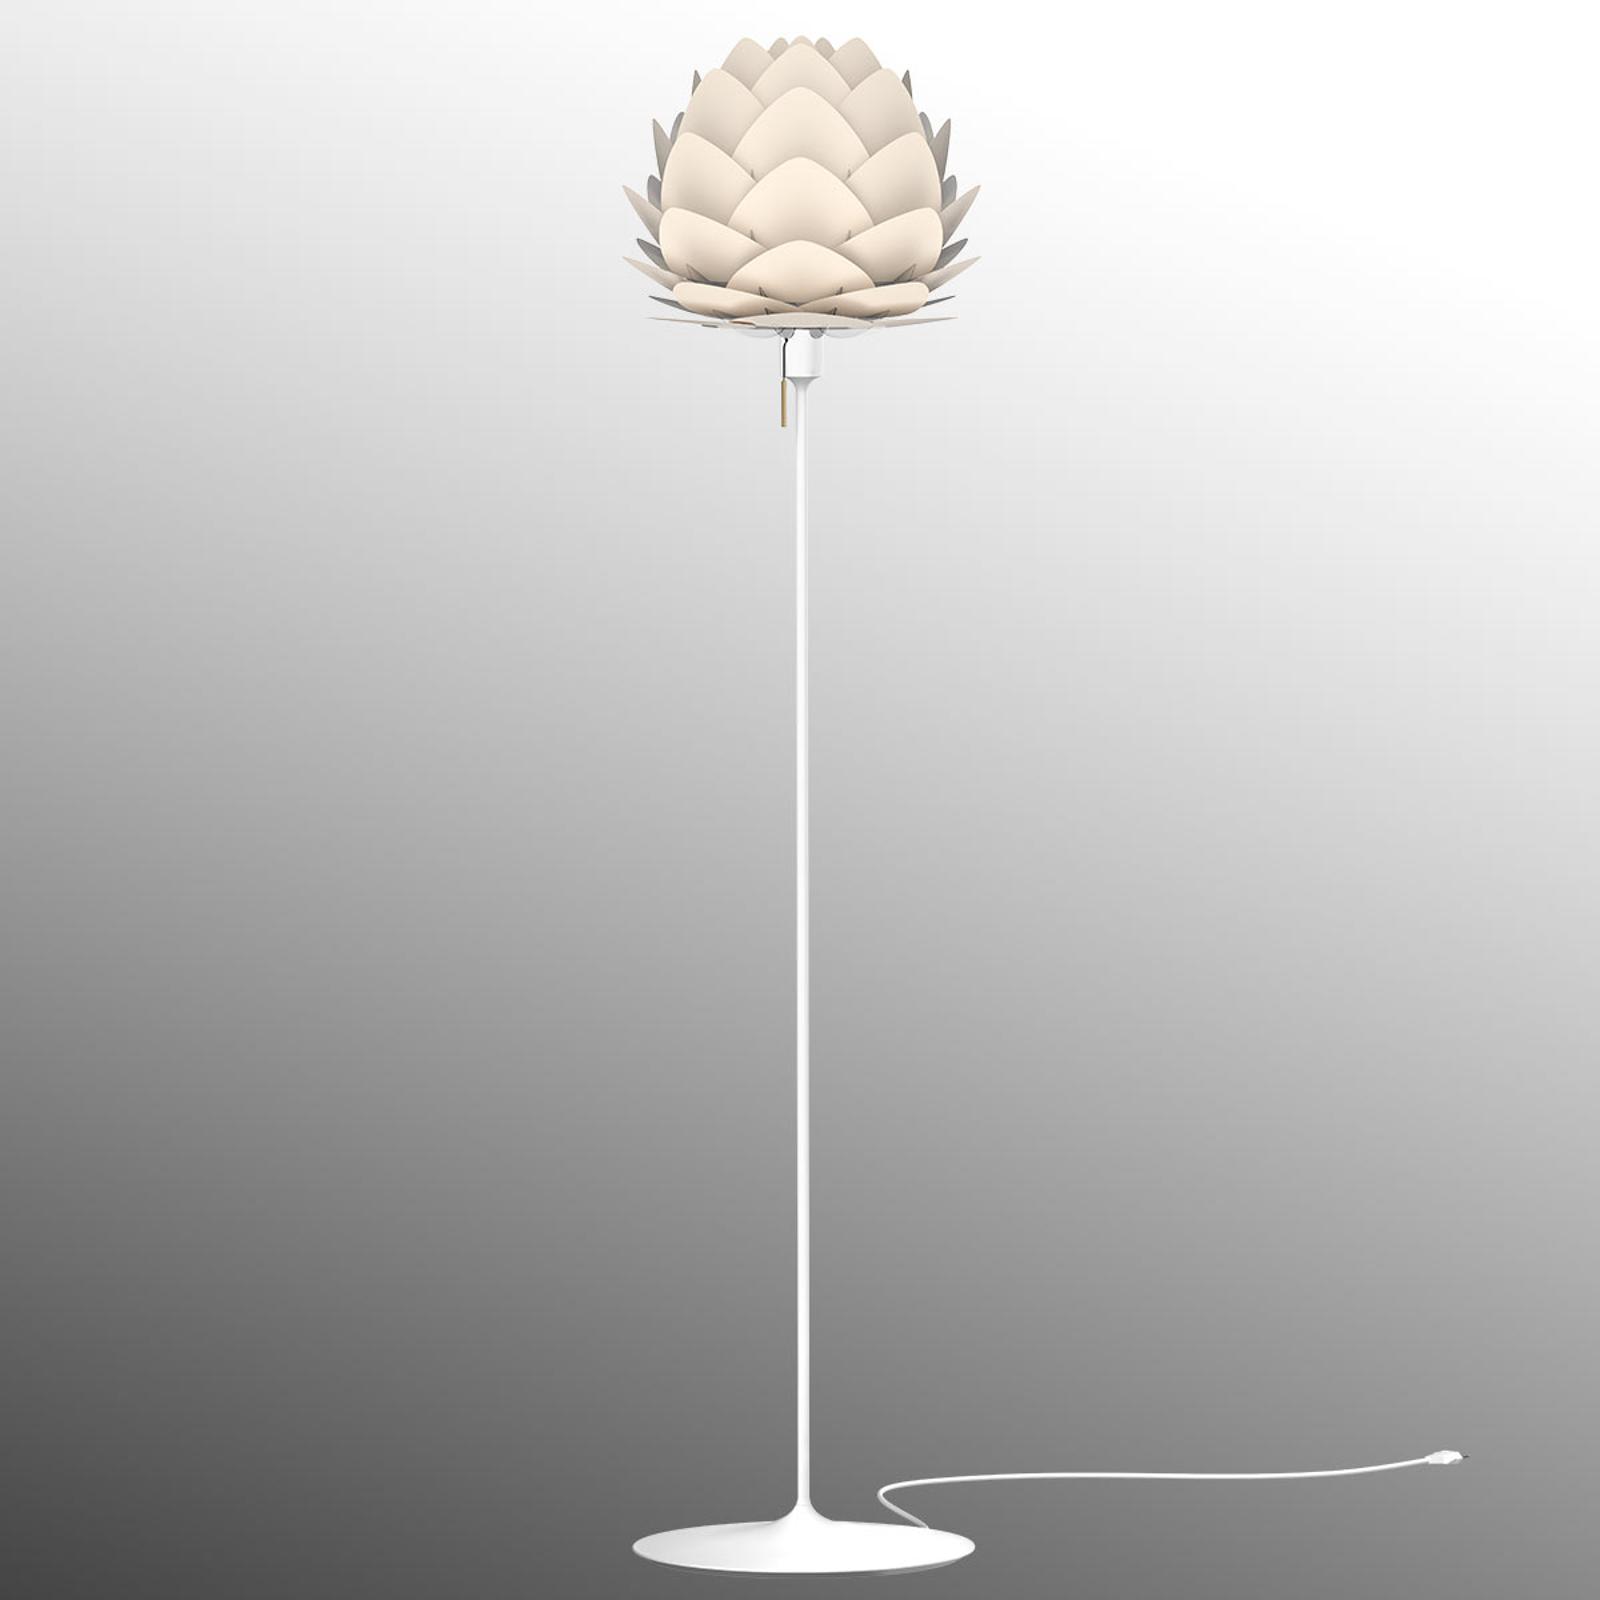 UMAGE Aluvia mini lampa stojąca, macica perłowa